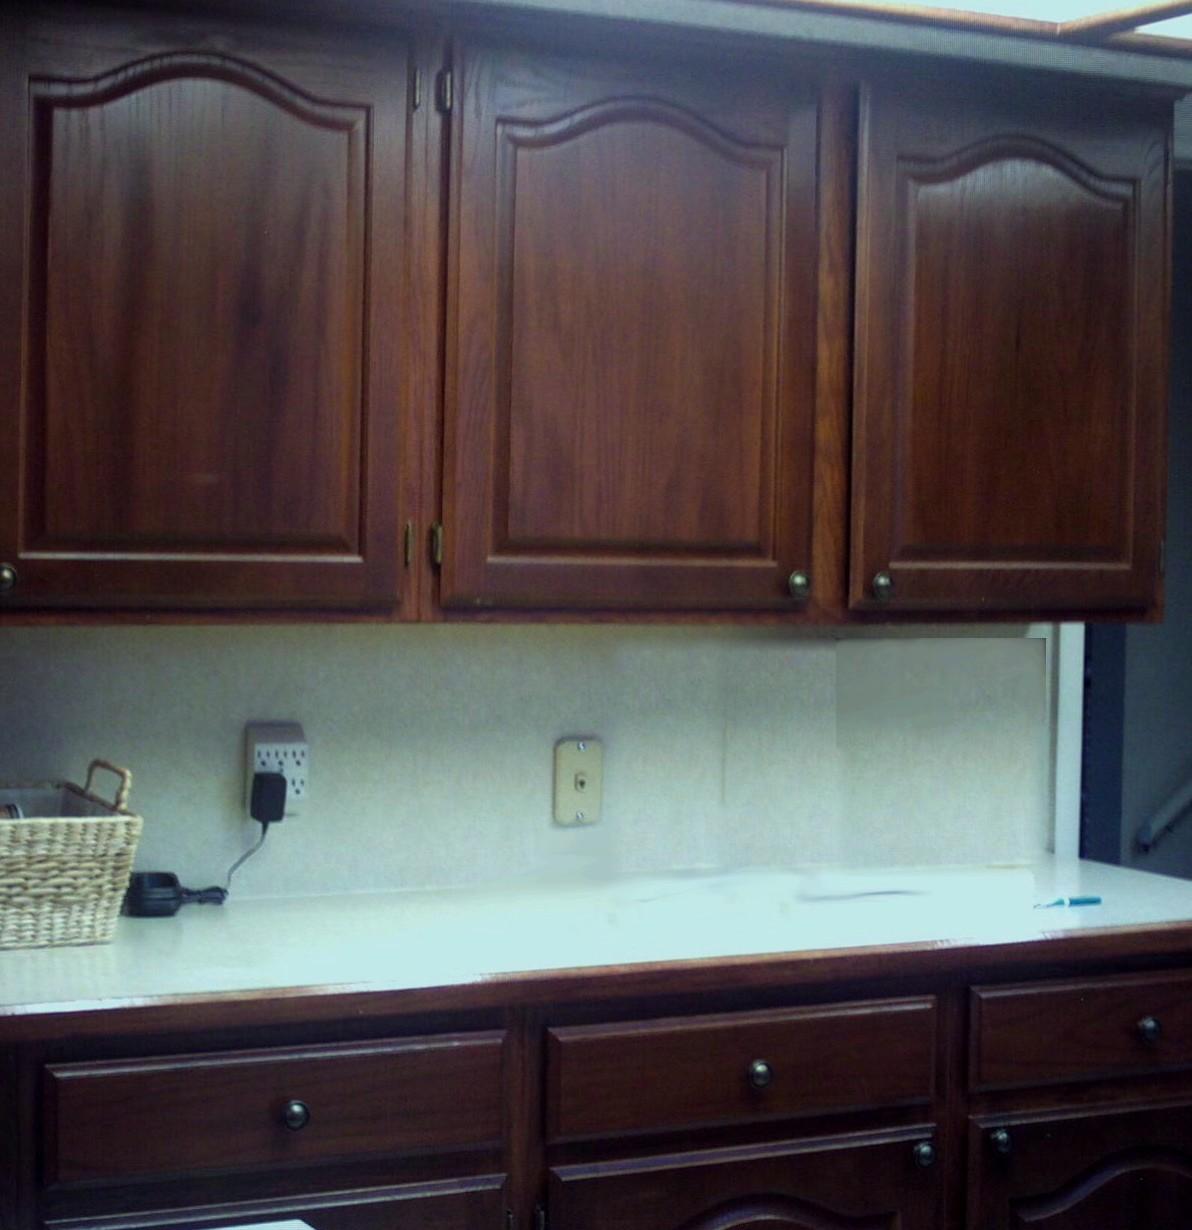 dark cabinet refinishing kitchen cabinet refinishing Kitchen cabinets and cupboards refinished in cherry wood color